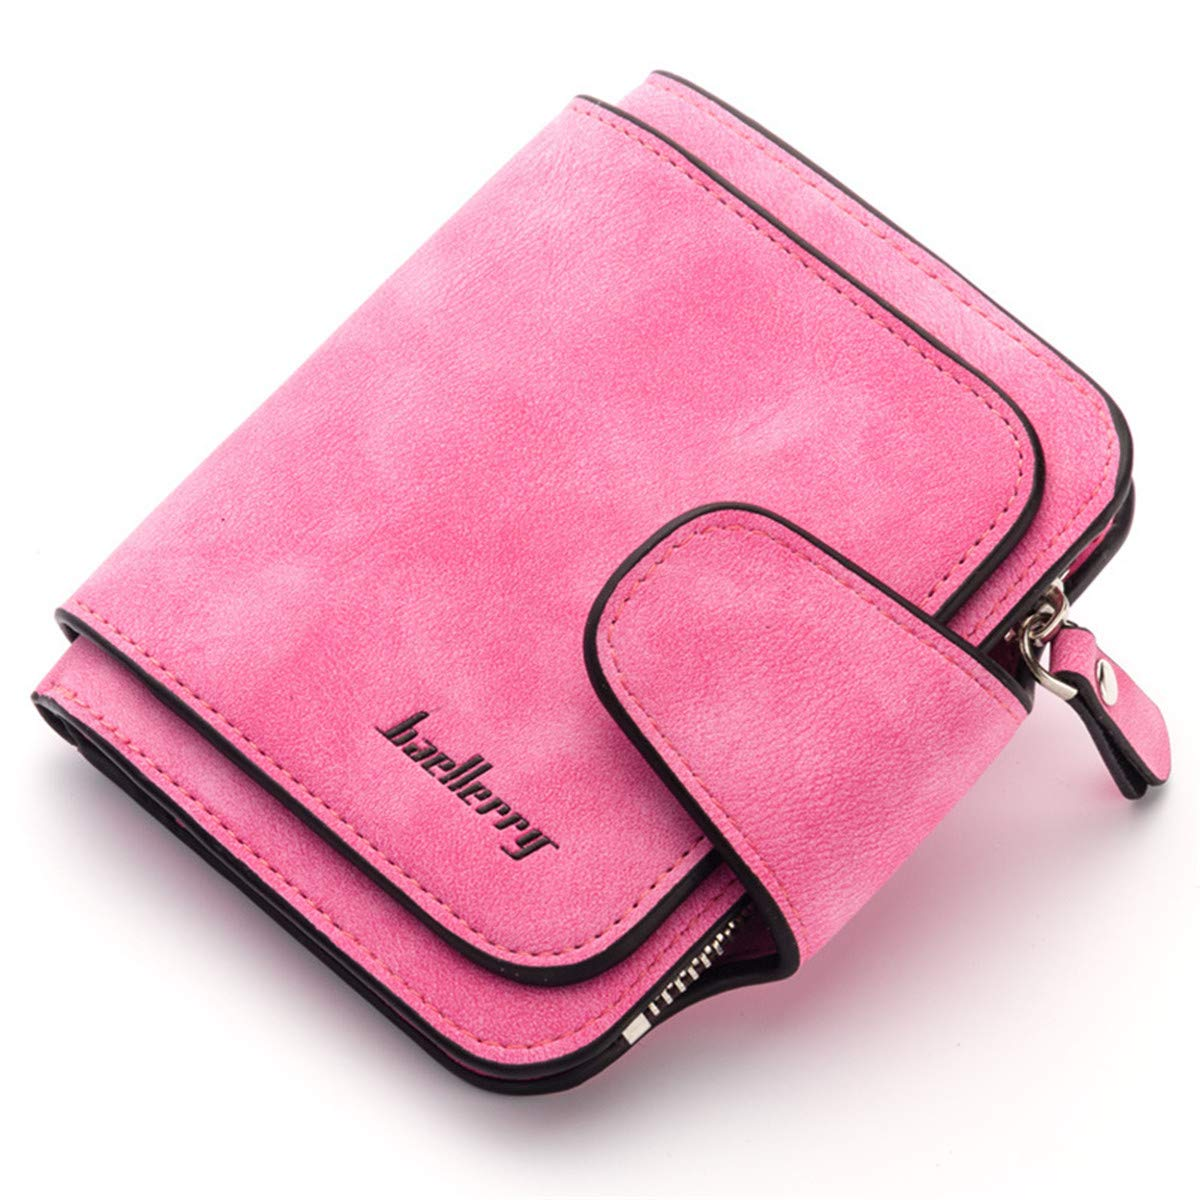 Women's Wallet Leather Long Bifold RFID Blocking Wallet